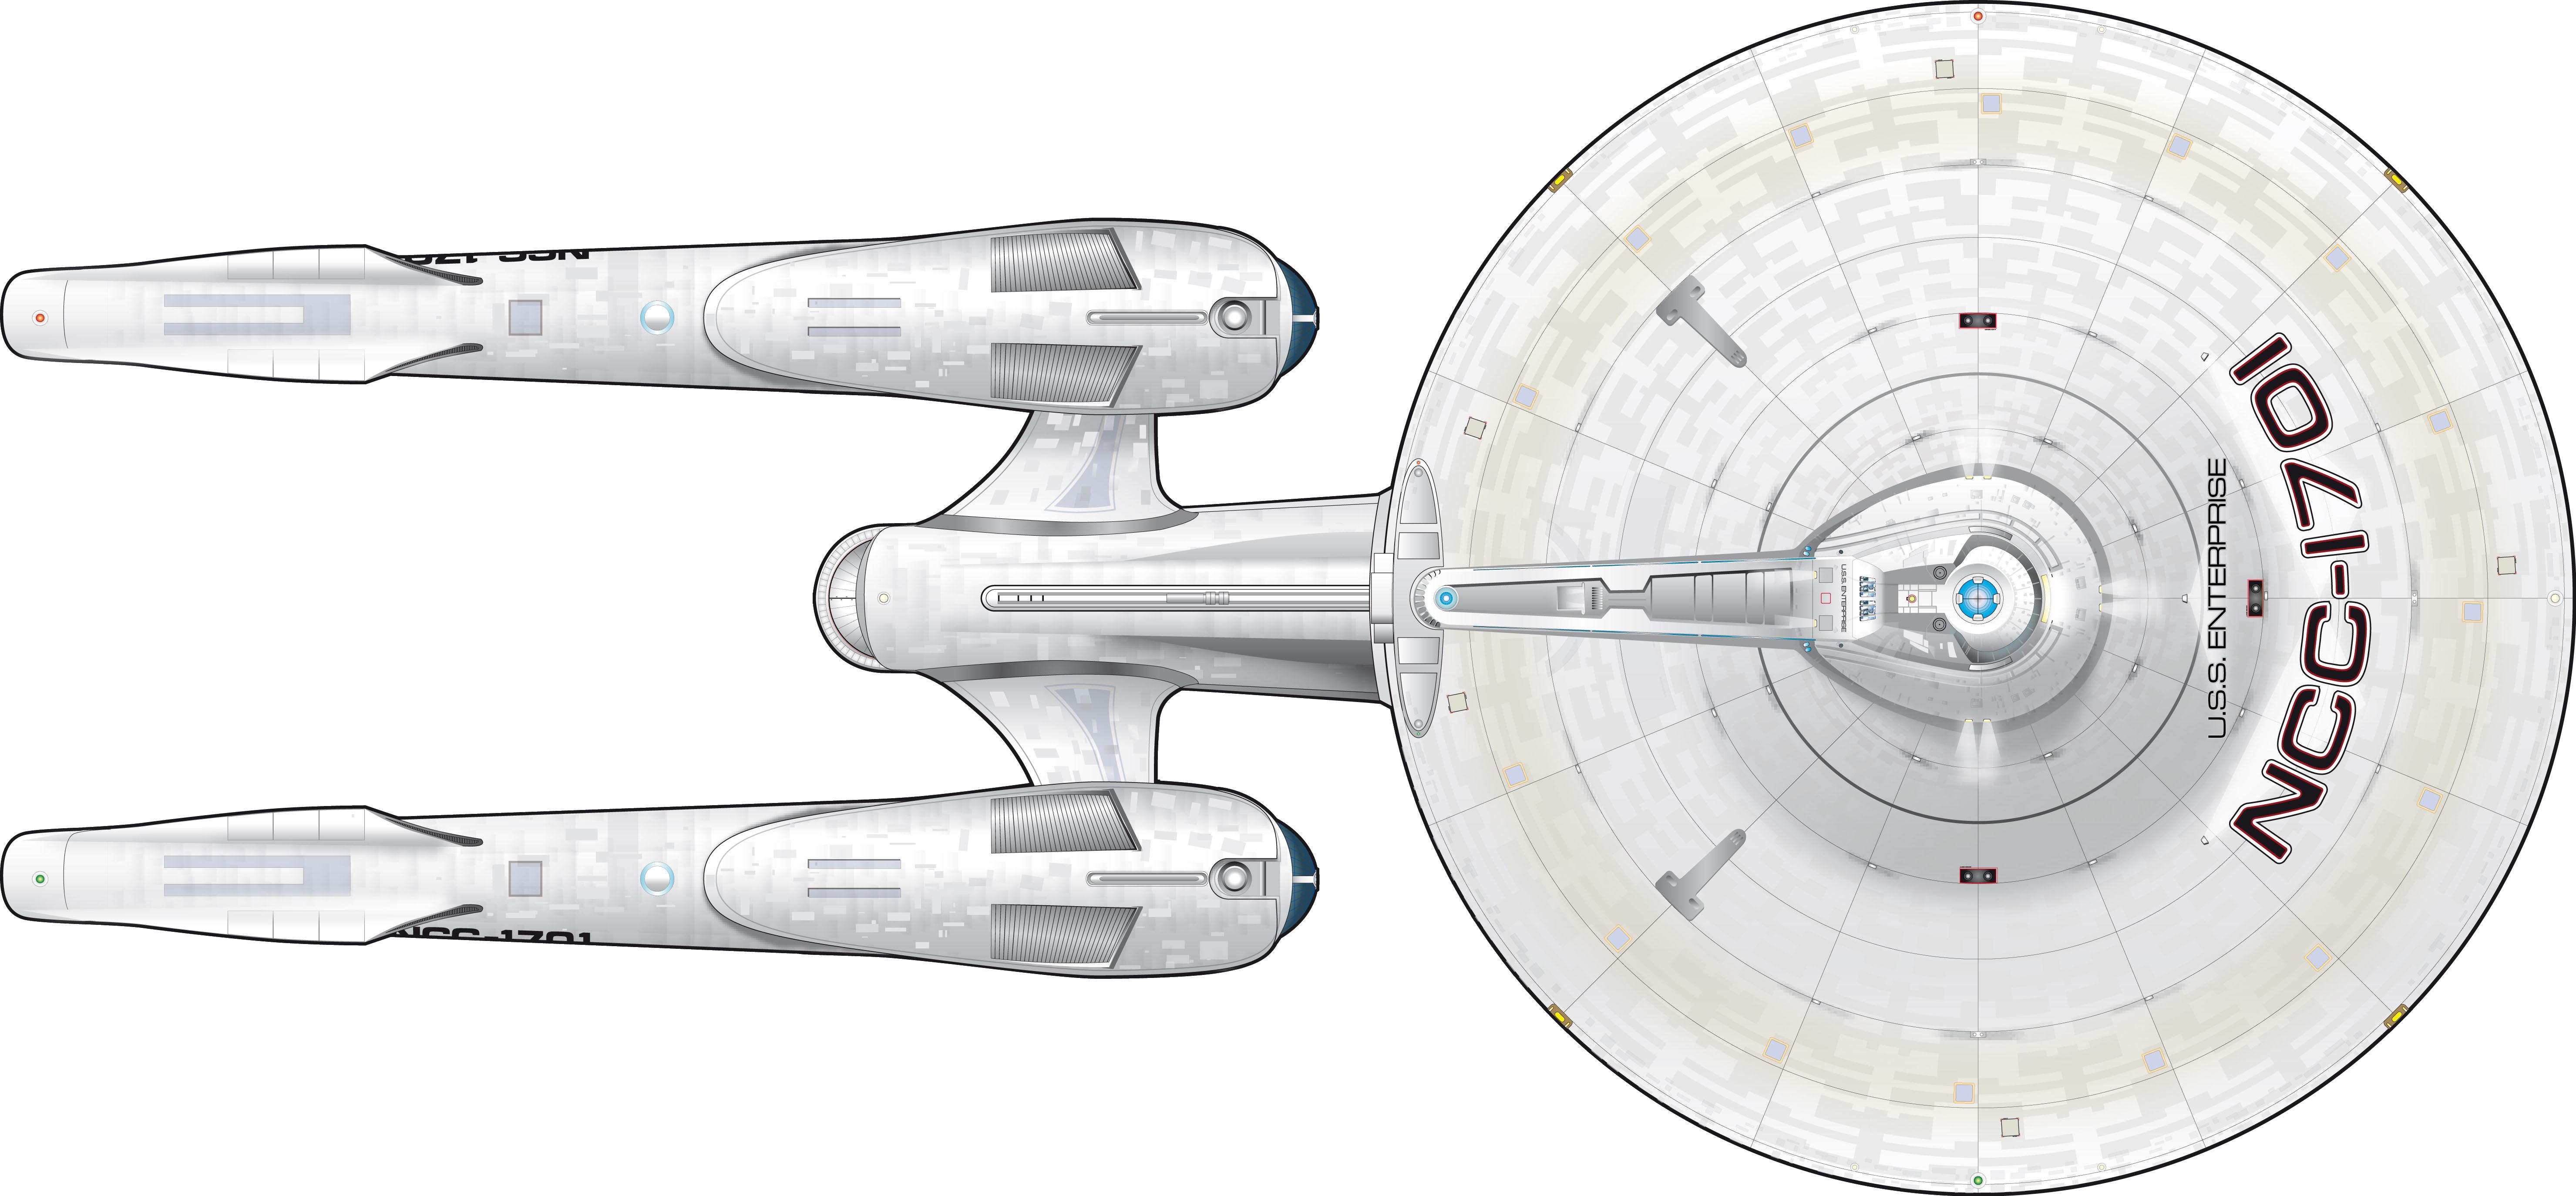 star trek blueprints star trek new enterprise color schematics